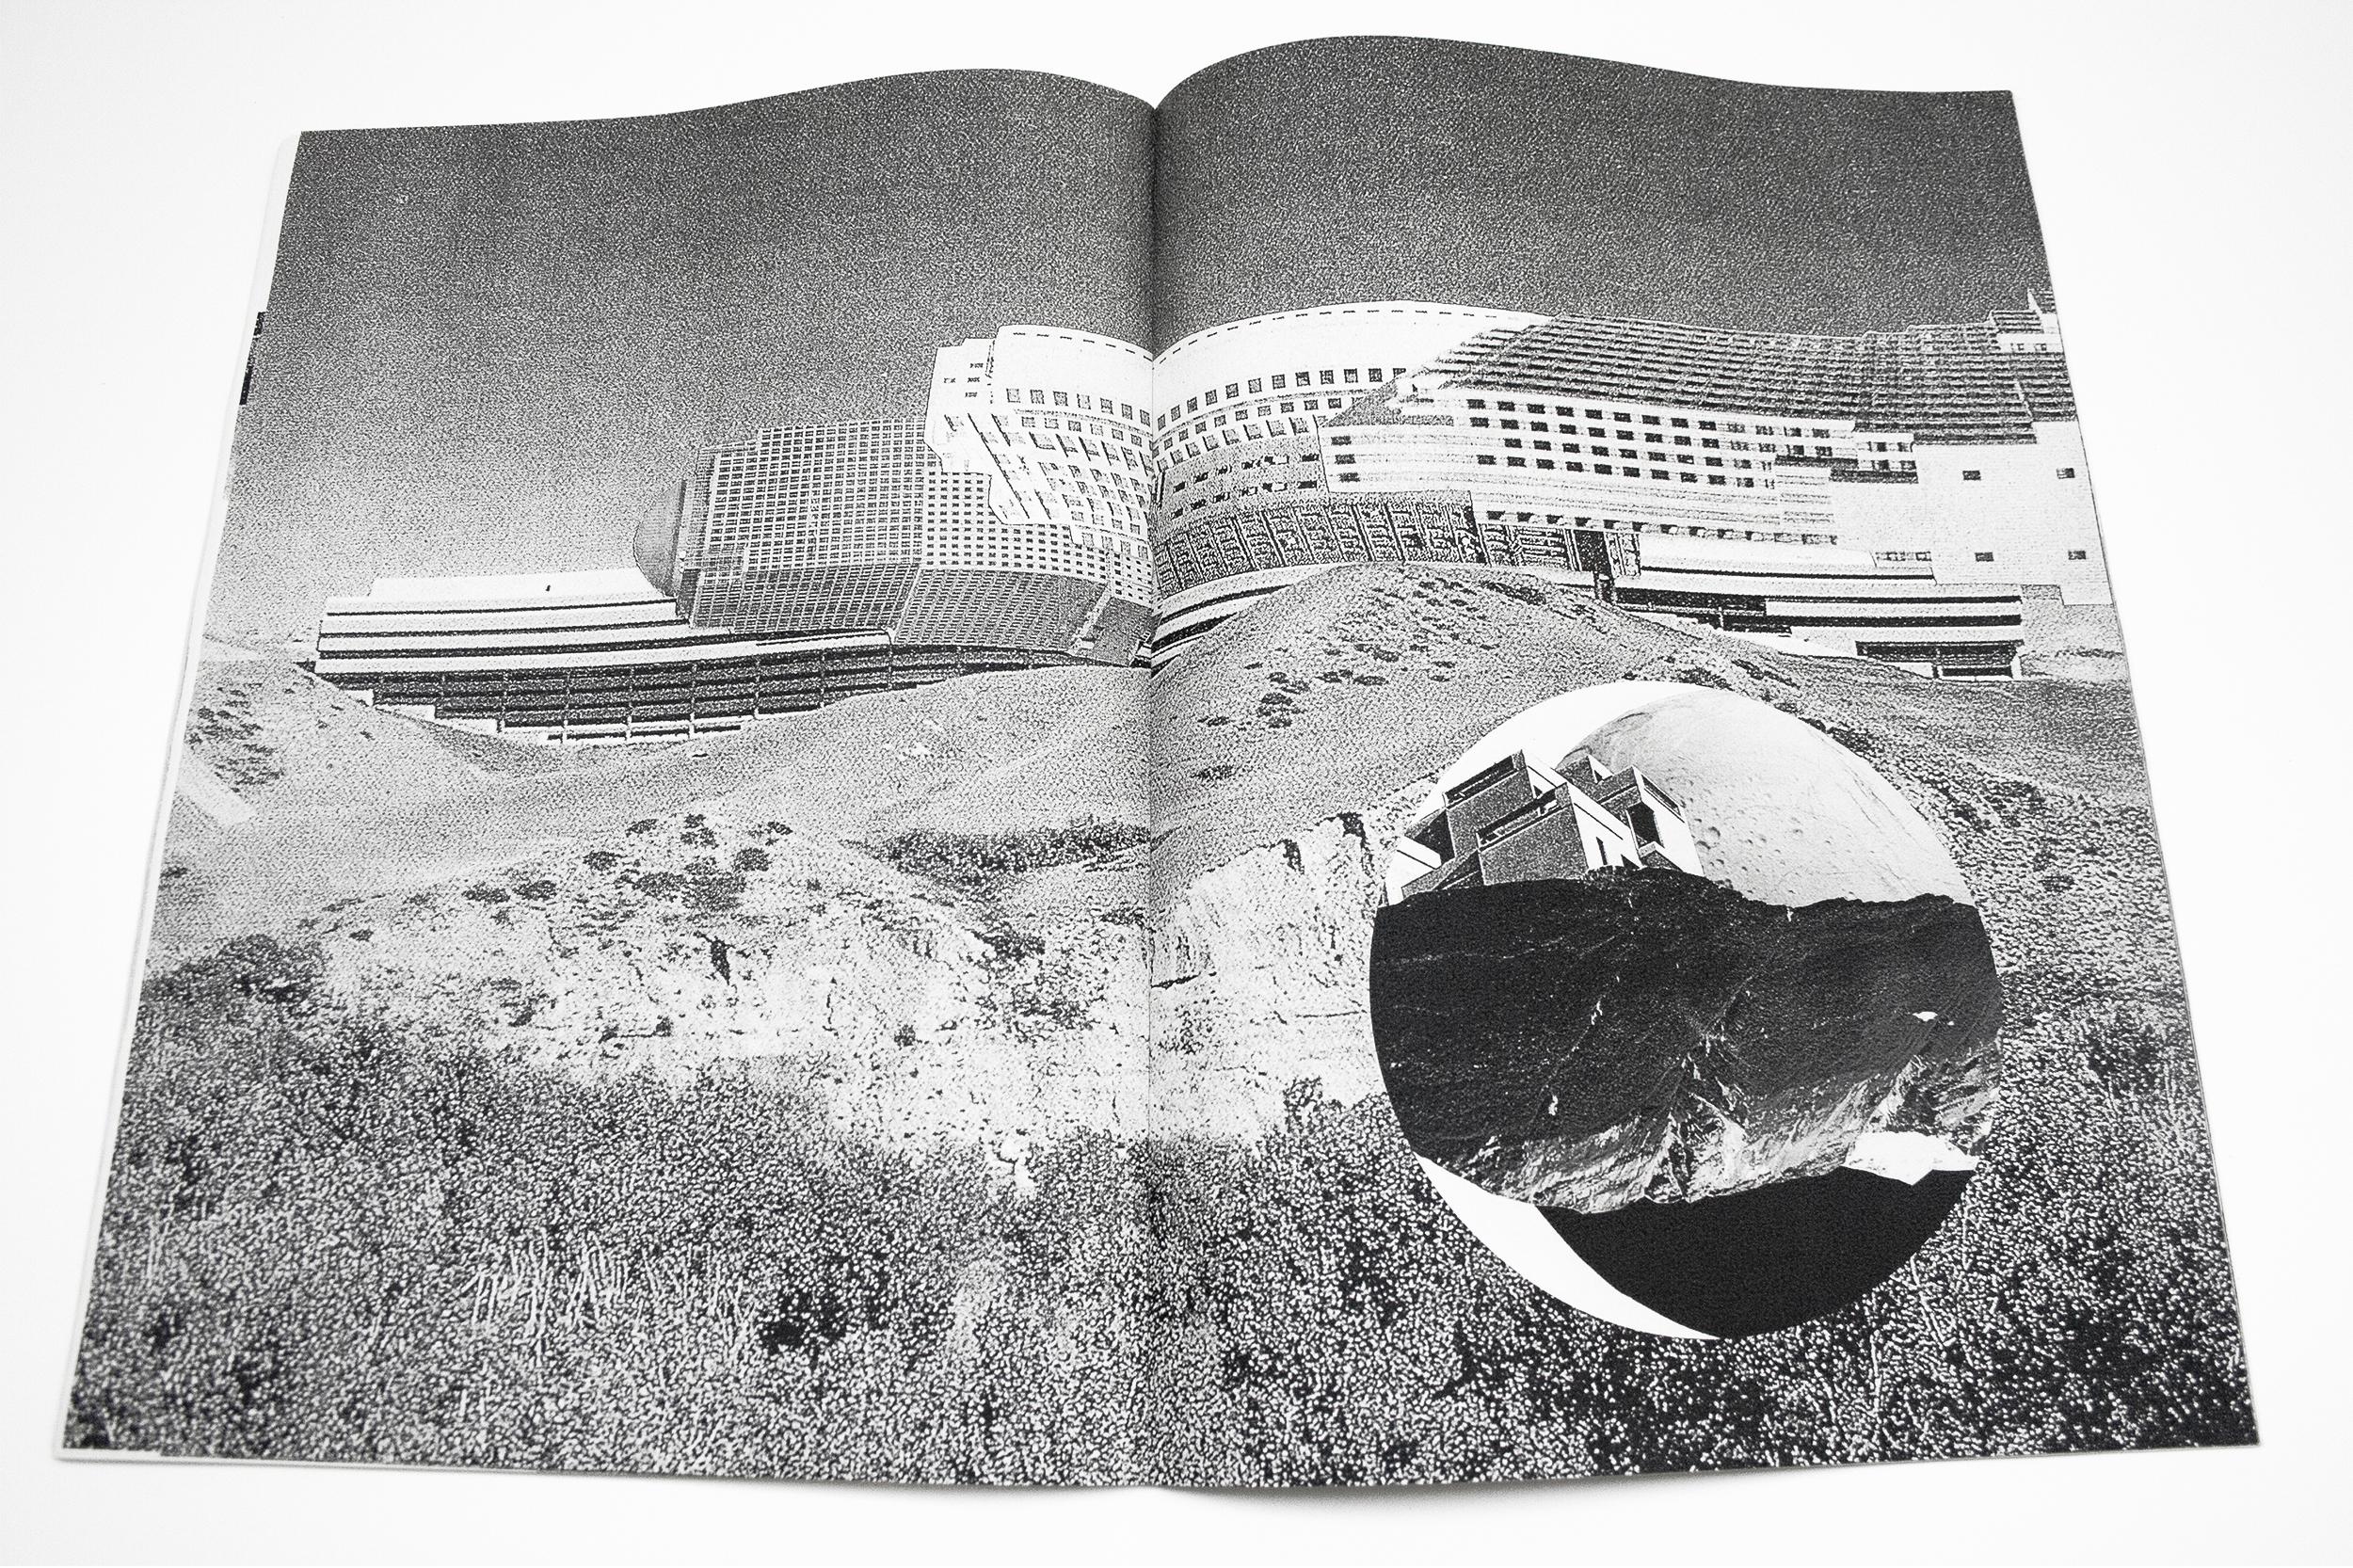 FARADAY_book_moonscape.jpg